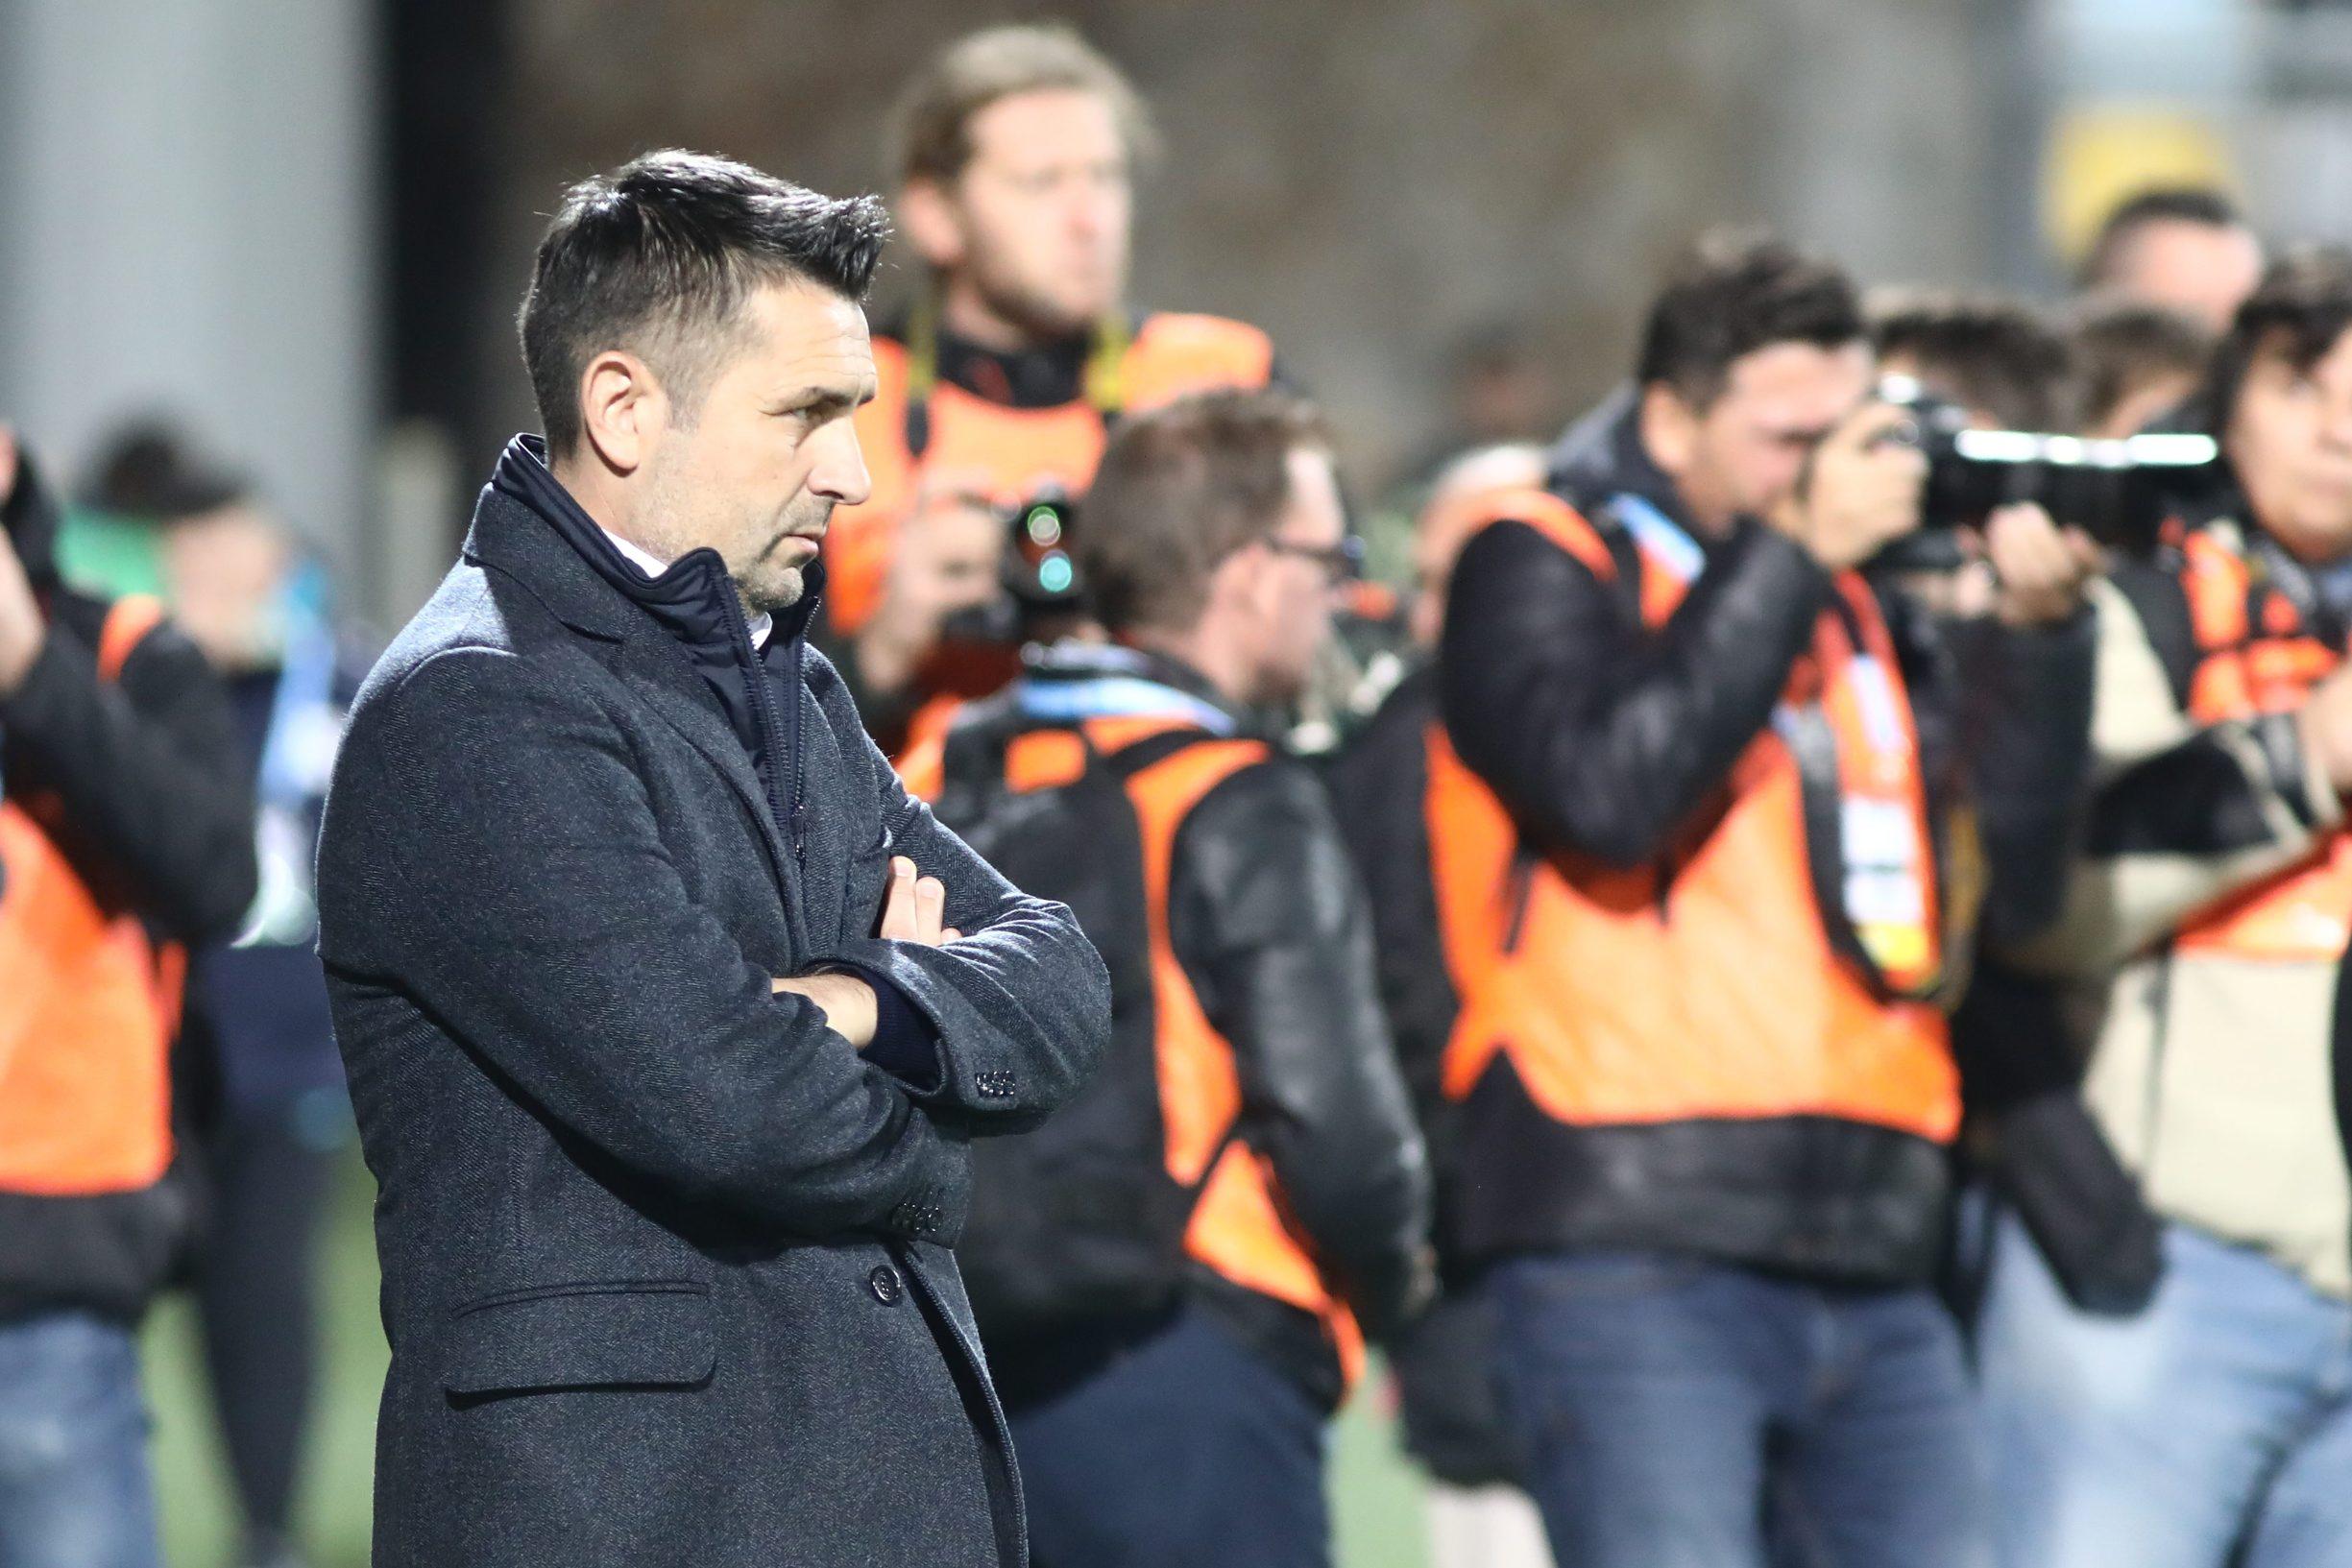 Rijeka, 101119. Stadion Rujevica. HNK Rijeka - Dinamo, 1. HT HNL, 15. kolo. Na fotografiji: Nenad Bjelica, trener. Foto: Matija Djanjesic / CROPIX